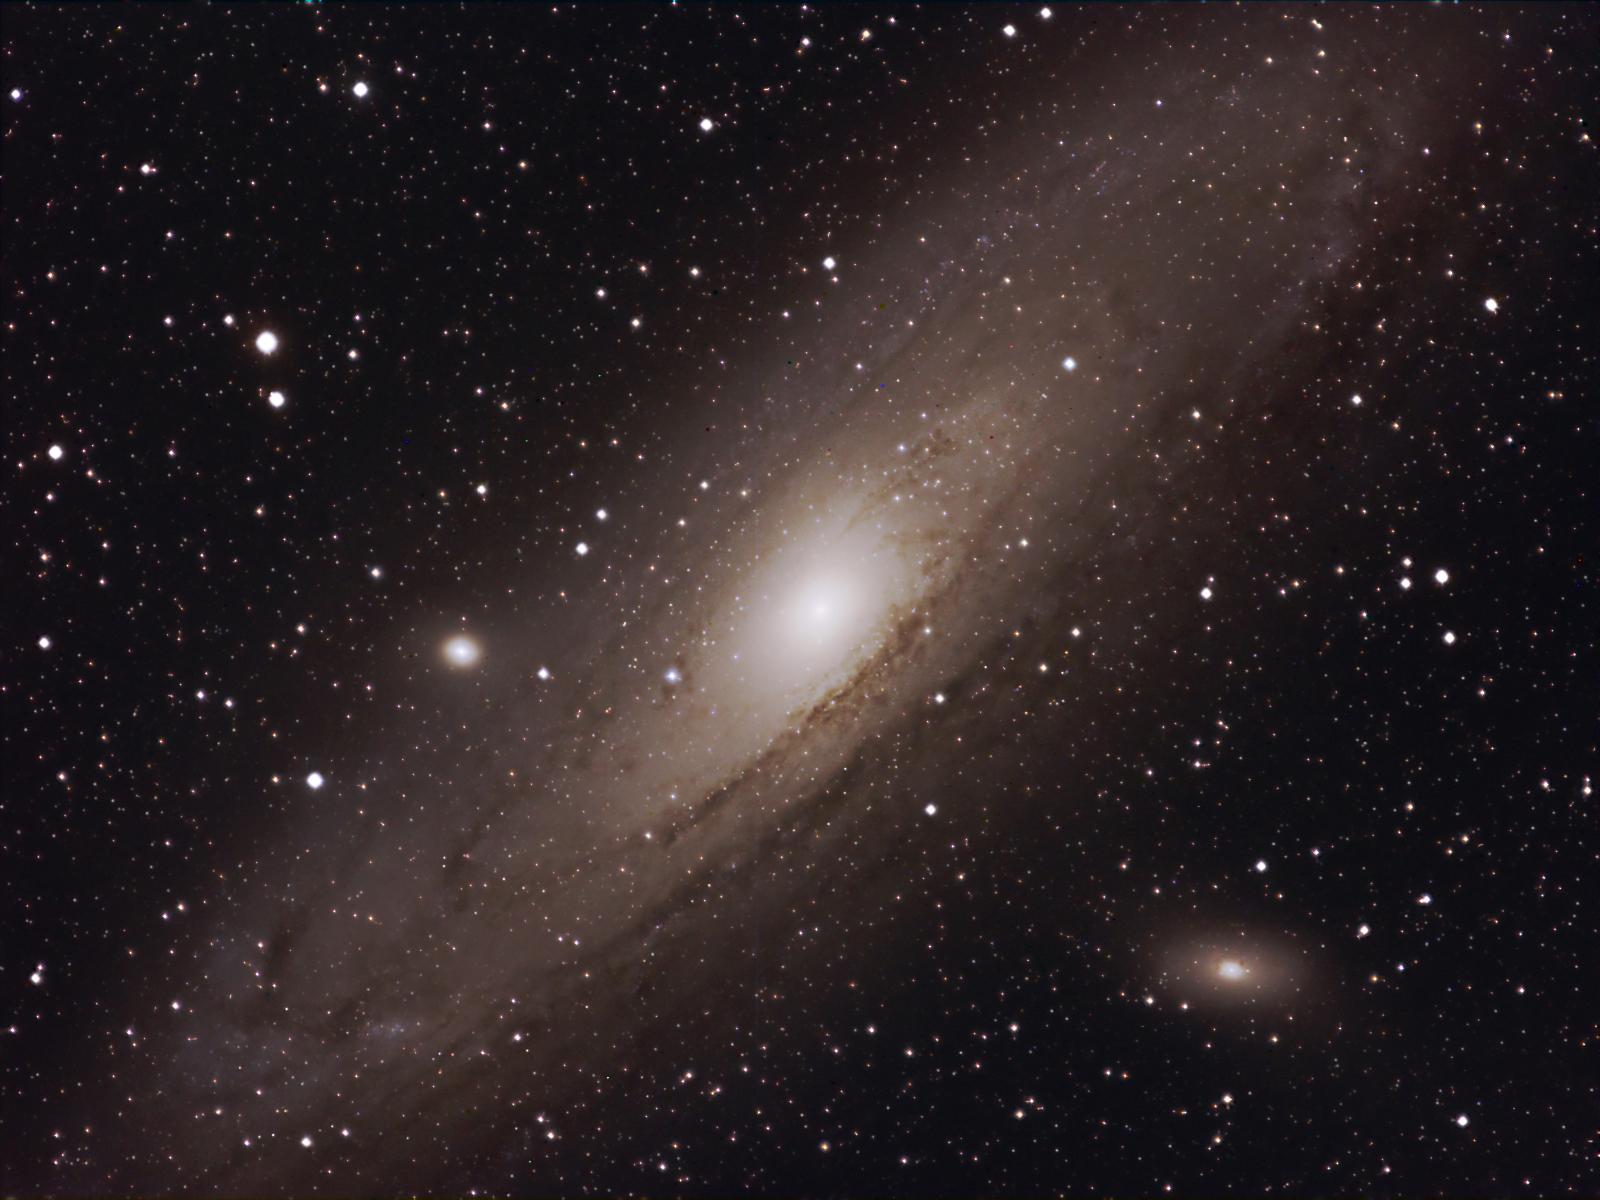 M31-1.jpg.eed916f380e7361ba9878c55fb1abc33.jpg